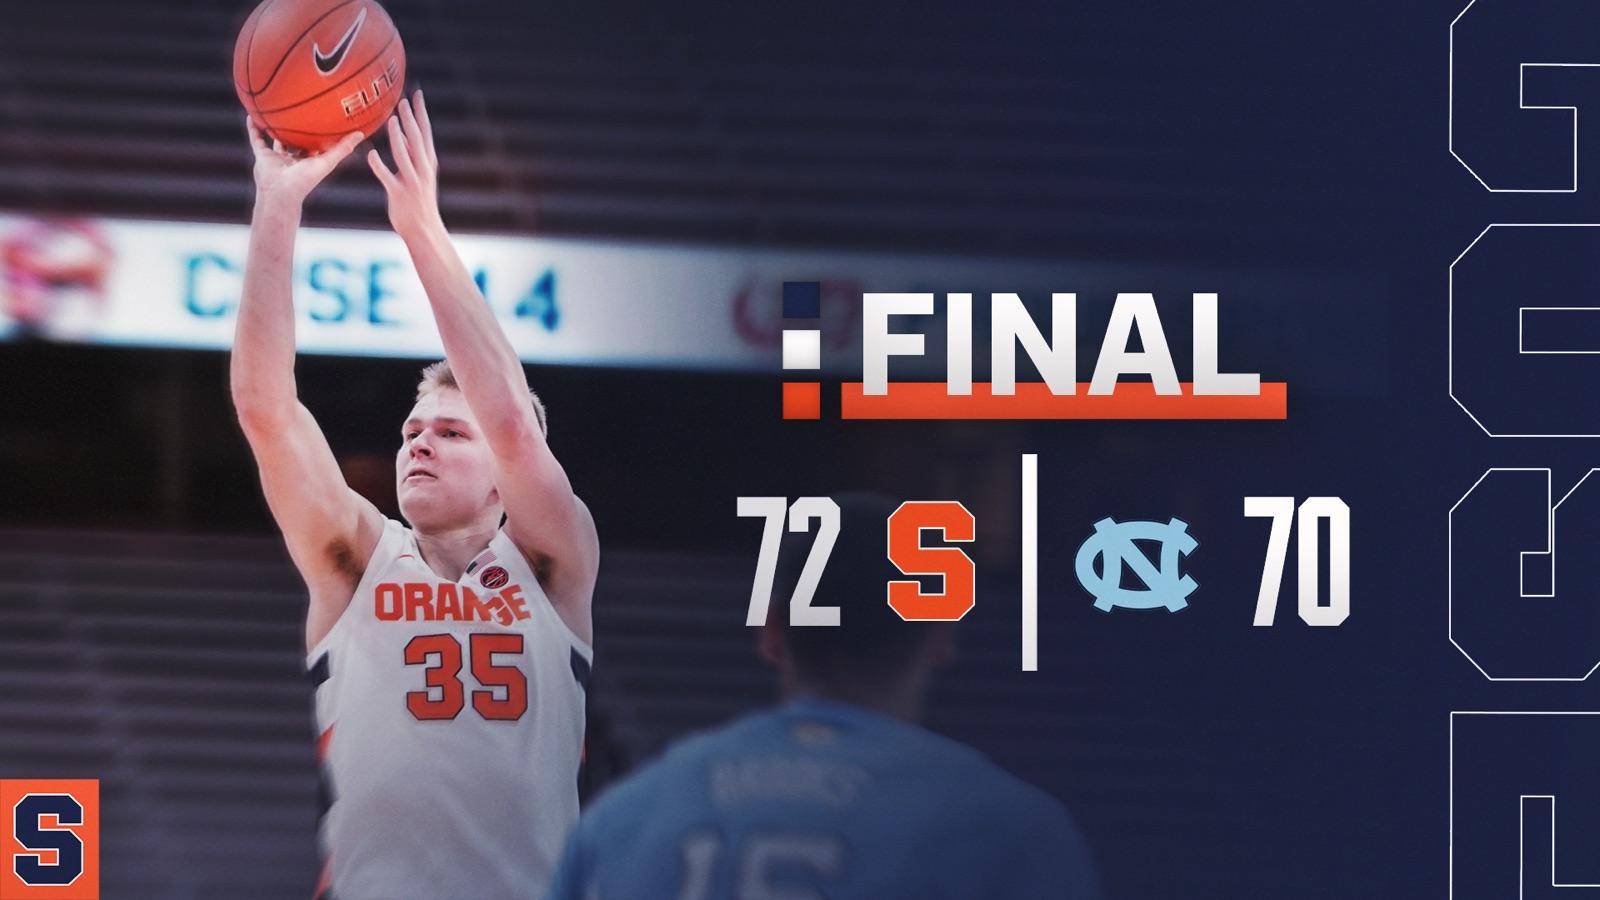 ORANGE GAME DAY: Syracuse hosts North Carolina tonight (preview, media & info)